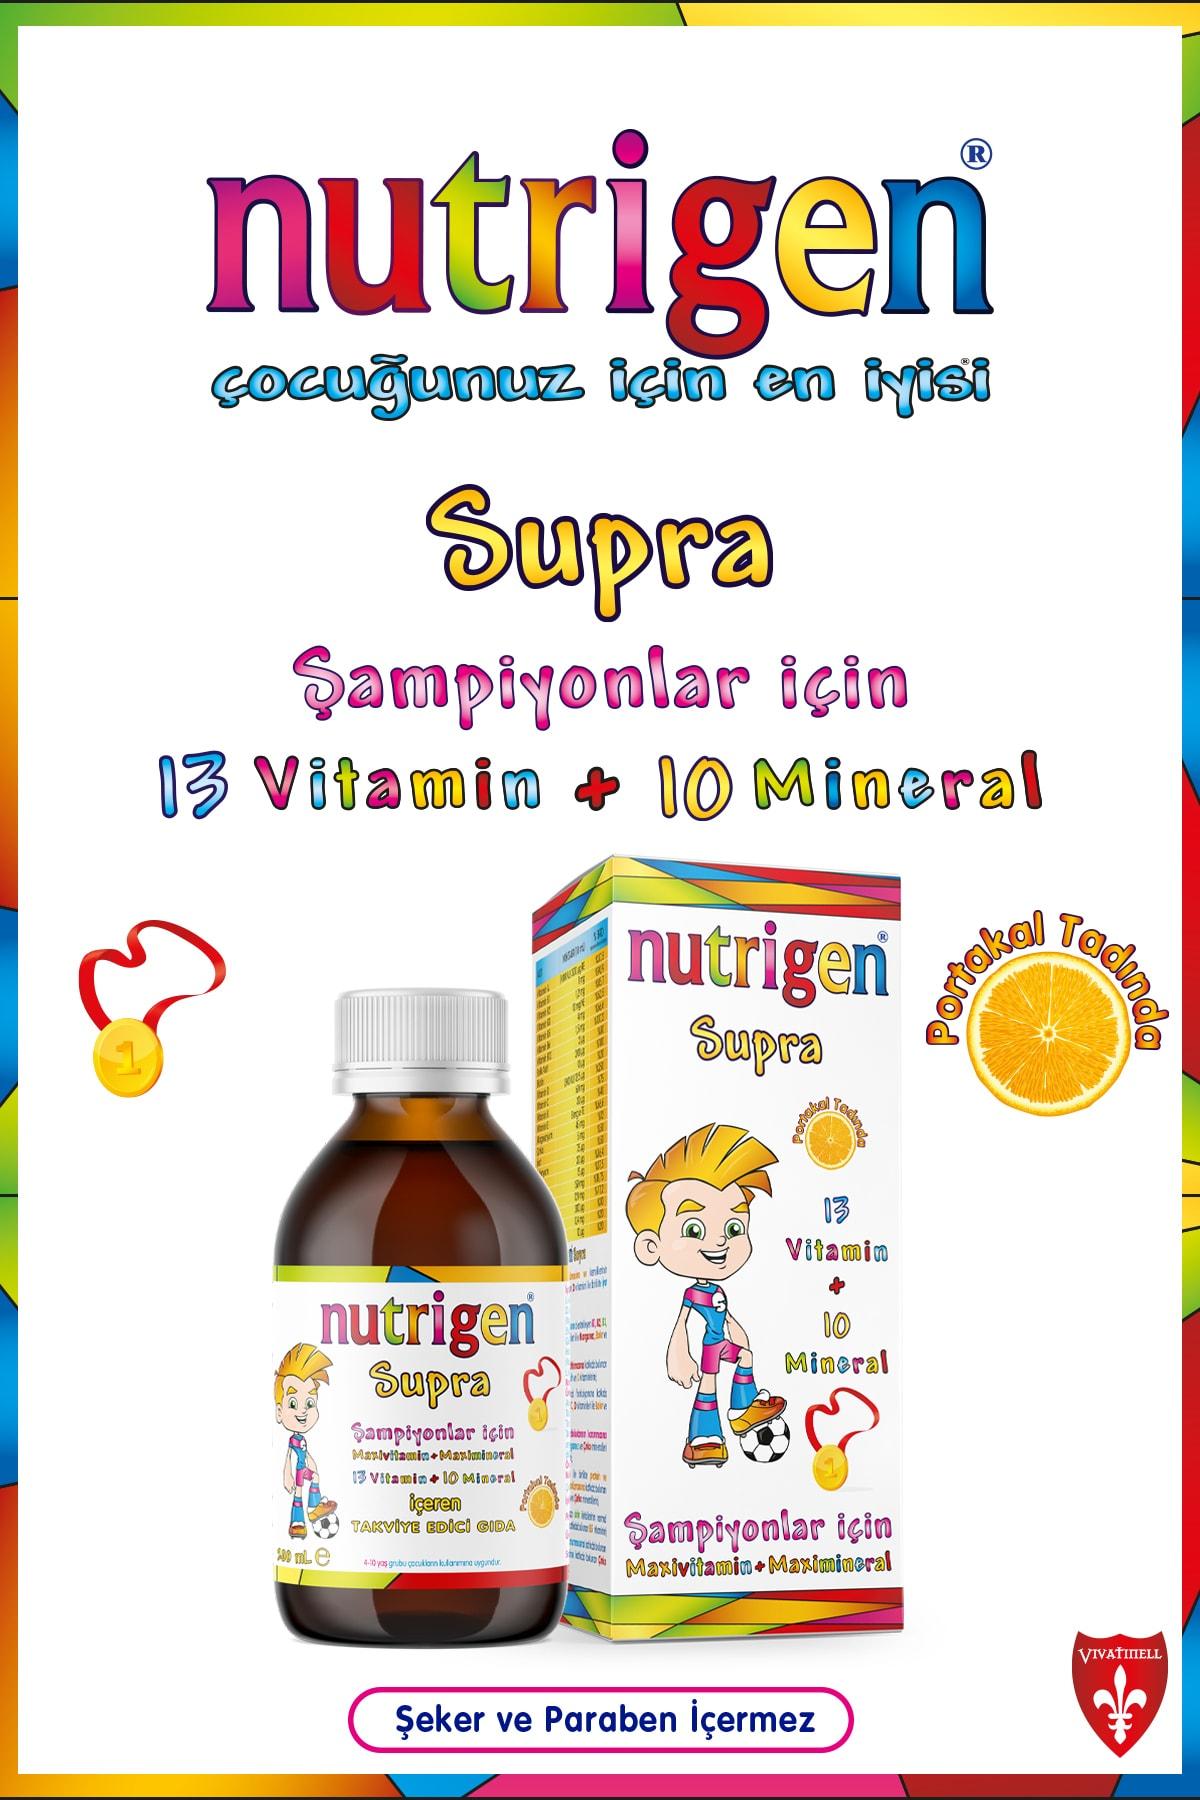 Nutrigen Supra Şurup 200 ml*2 (2'li Fırsat Paketi) 2